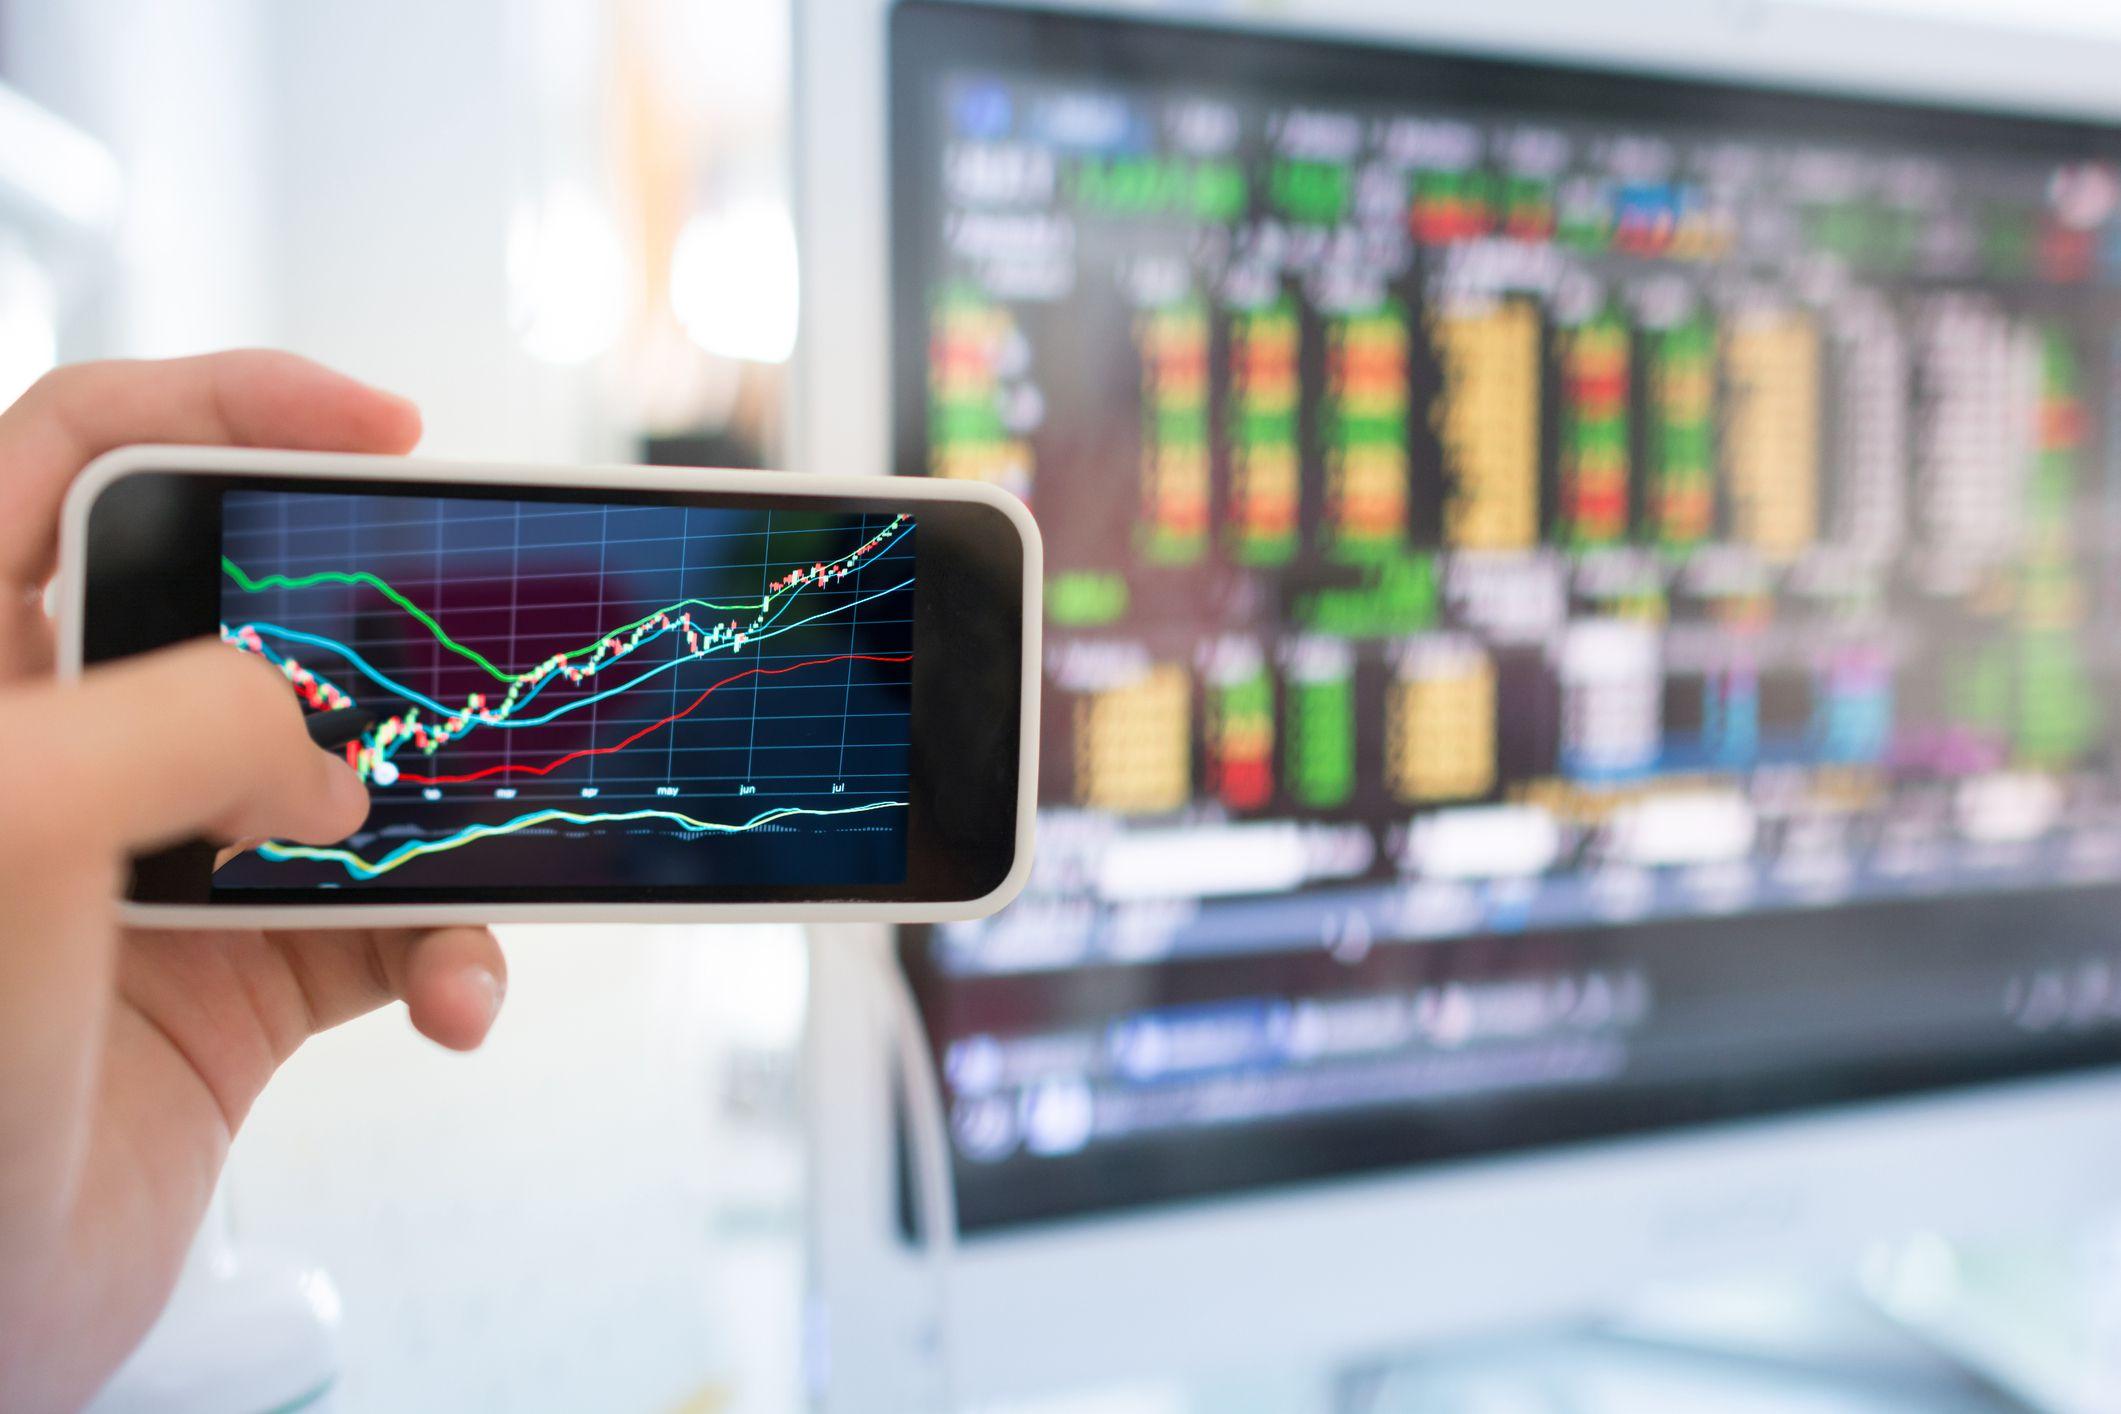 Day trading options vs stocks